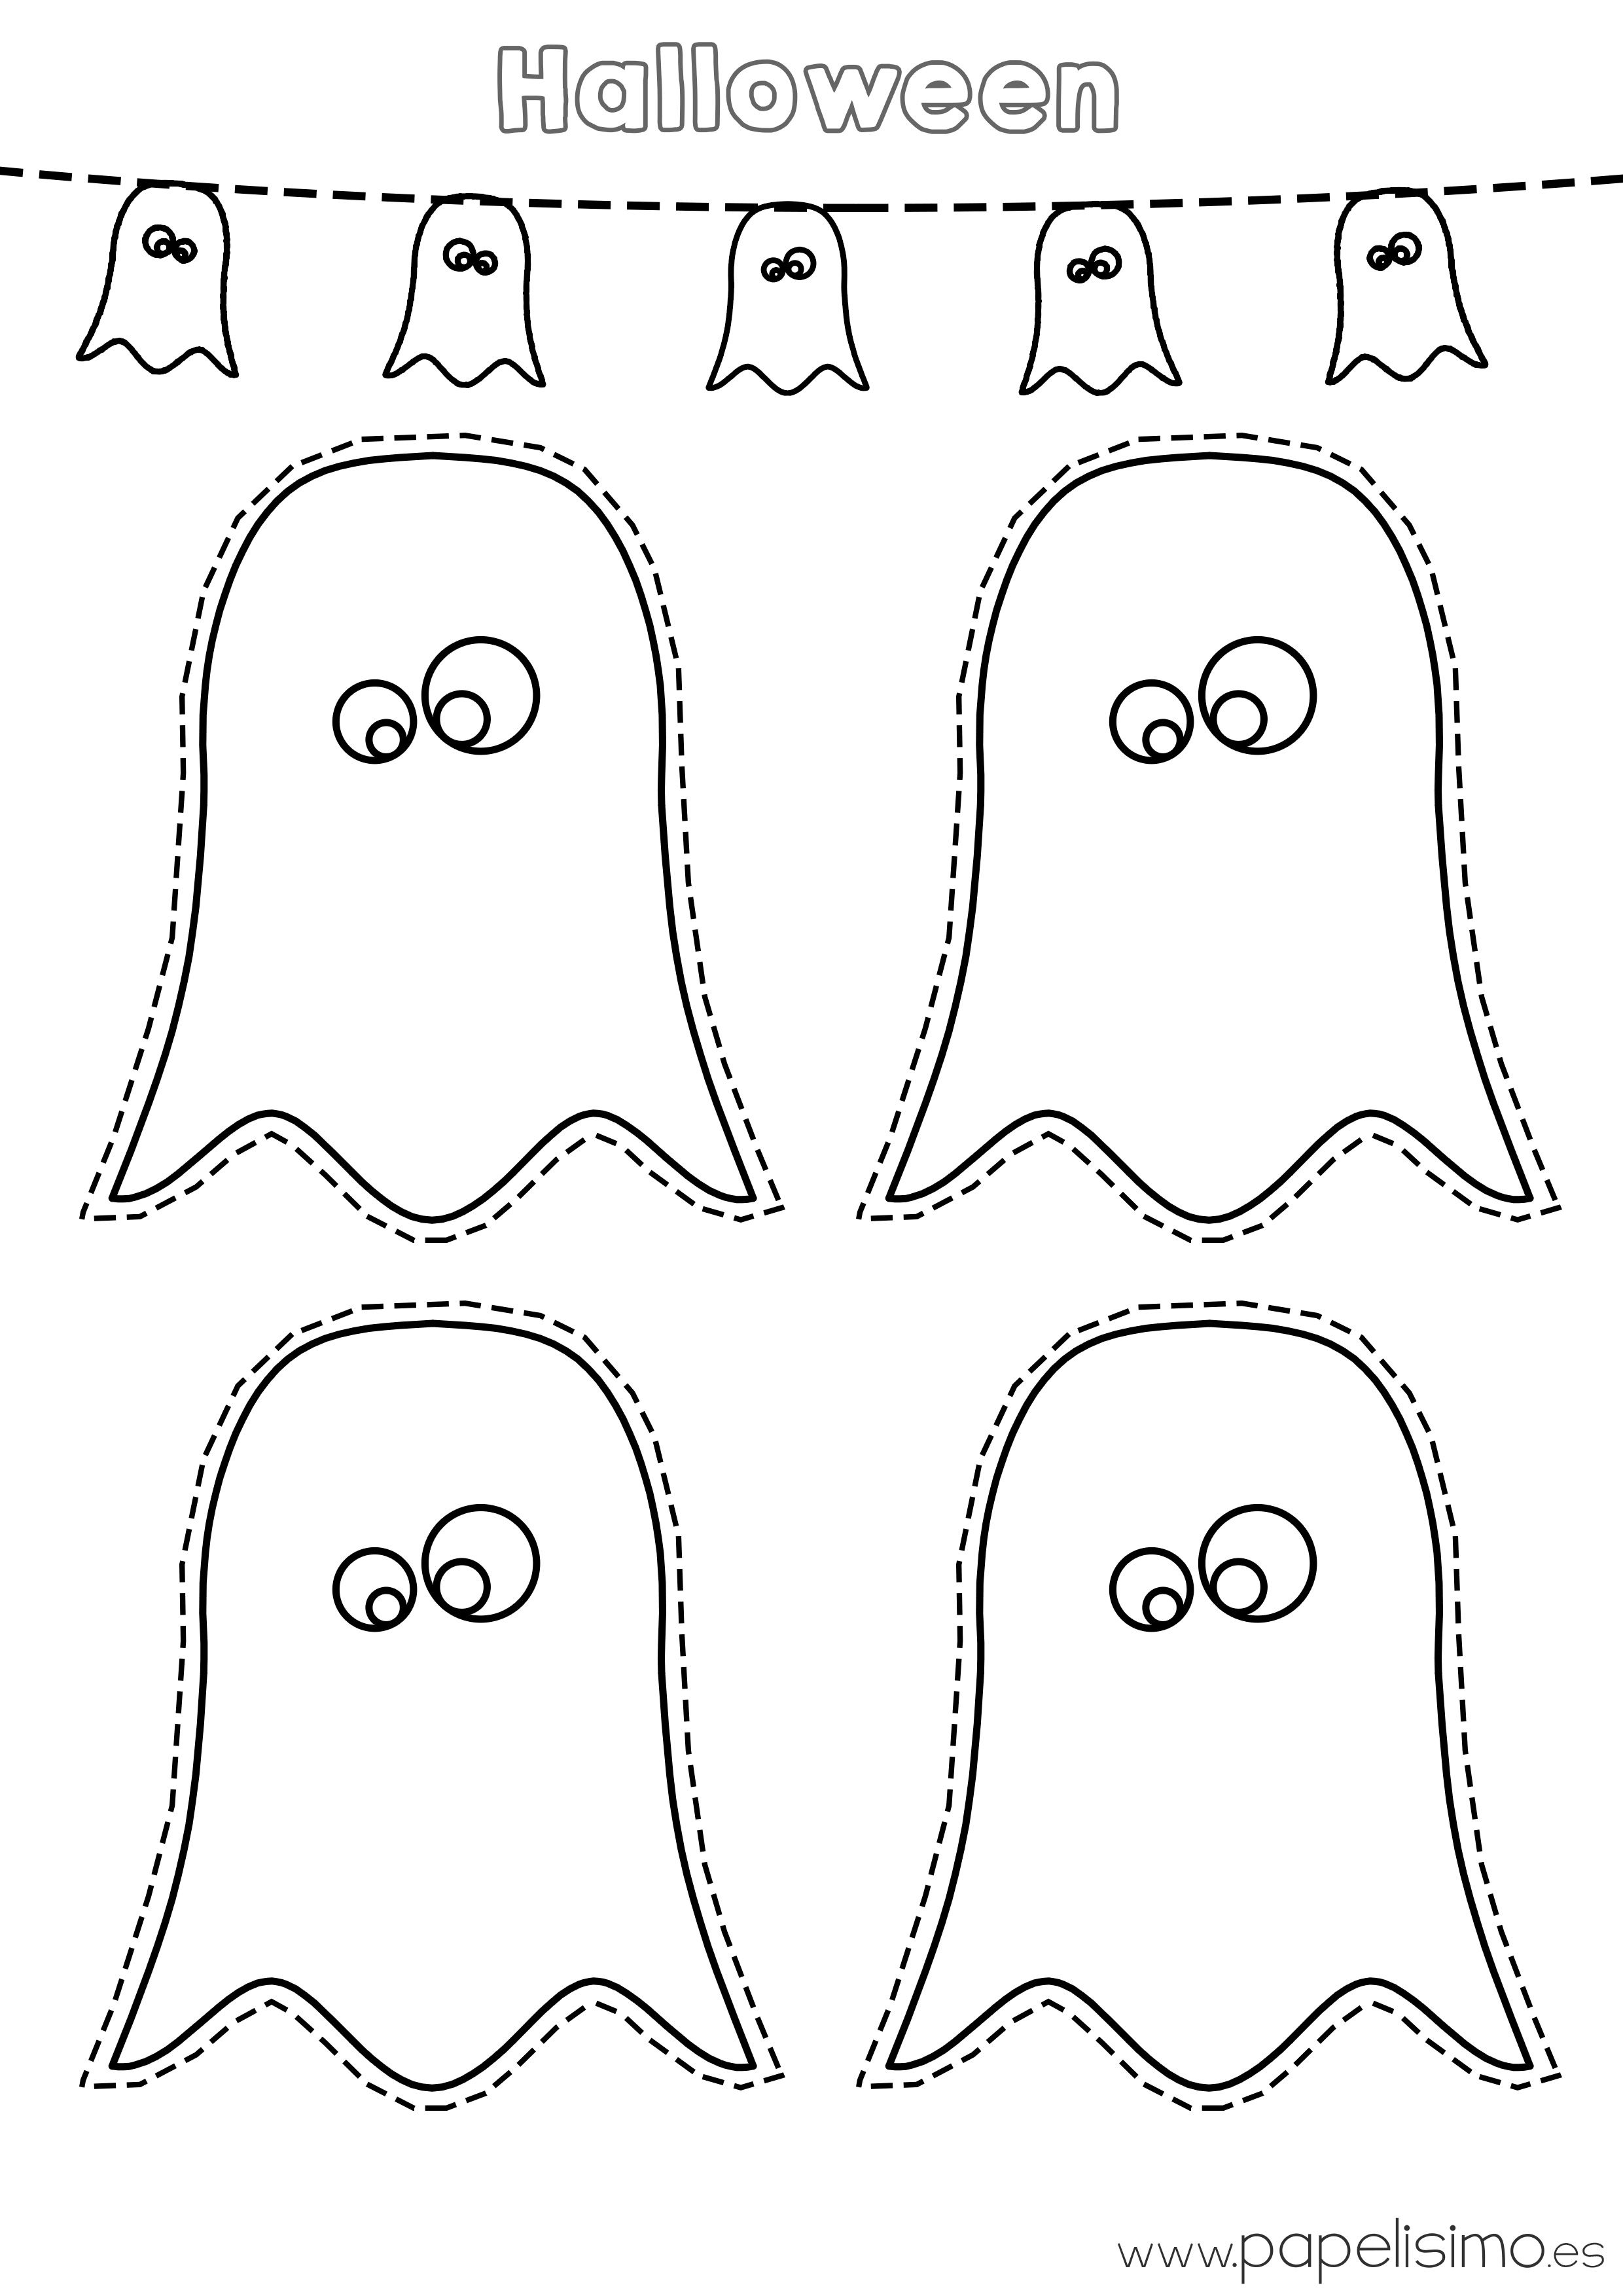 Dibujos De Fantasmas Halloween Para Imprimir Papelisimo Fantasmas De Halloween Plantillas De Halloween Dibujos De Halloween